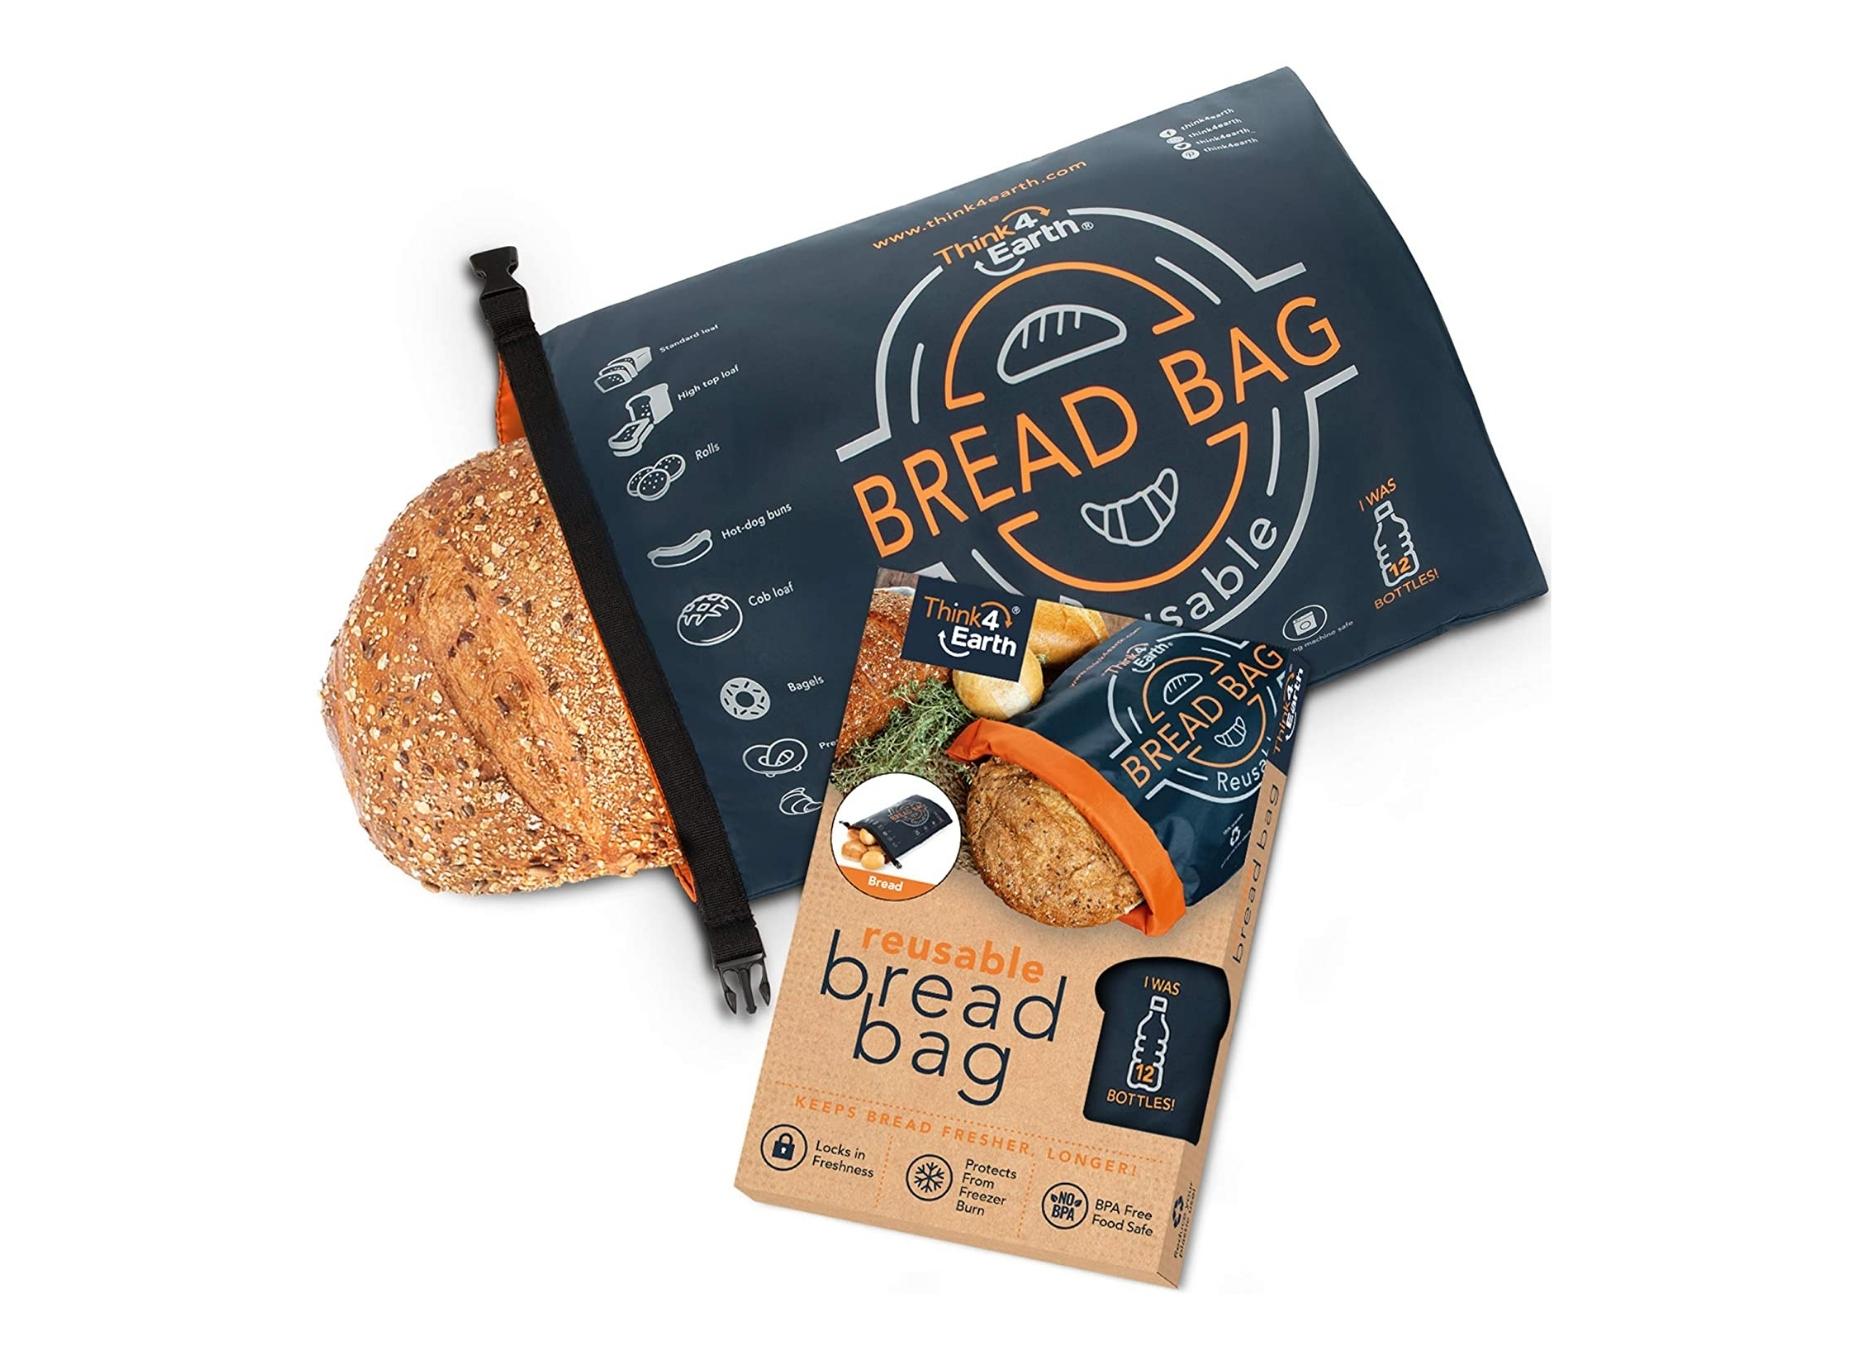 Bread bag freezer